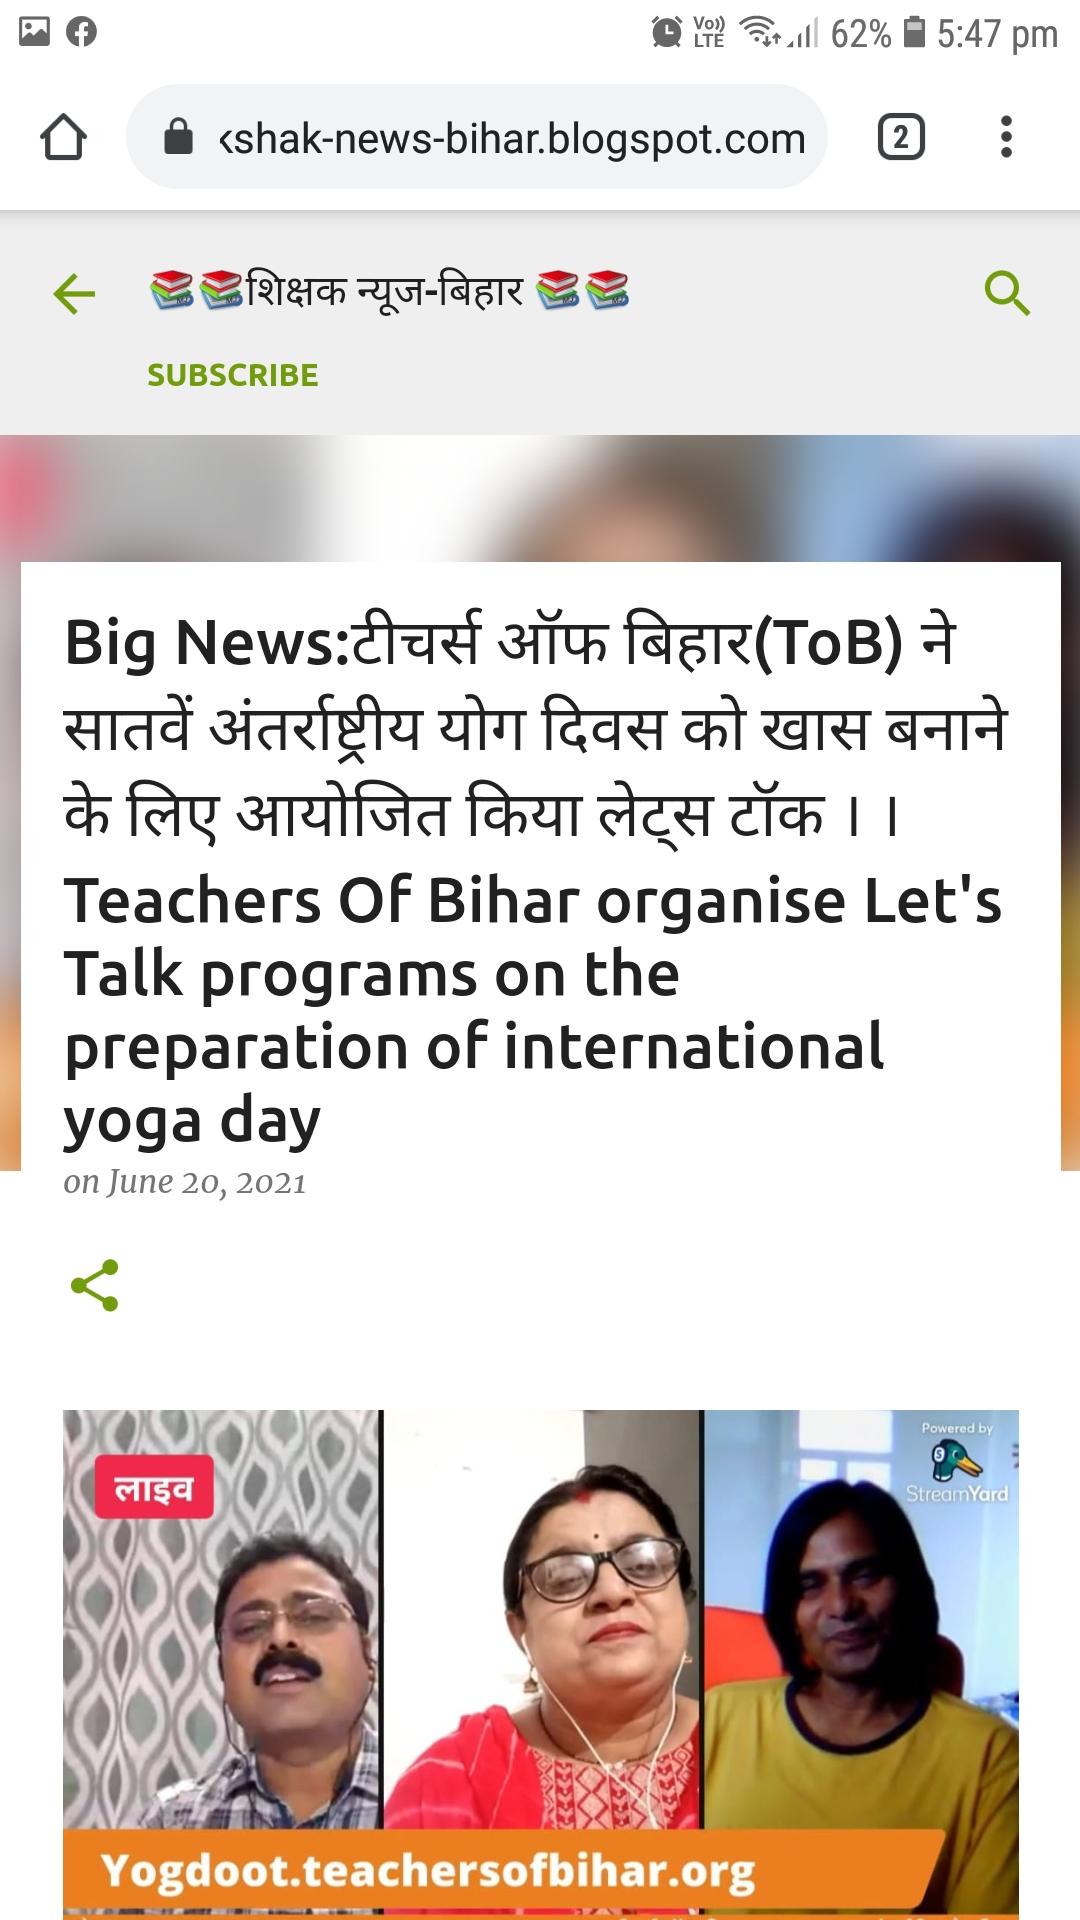 Let's Talk program on 'Yoga, Pranayam & Health Benefits' on the occasion of International Yoga Day ,20-06-2021